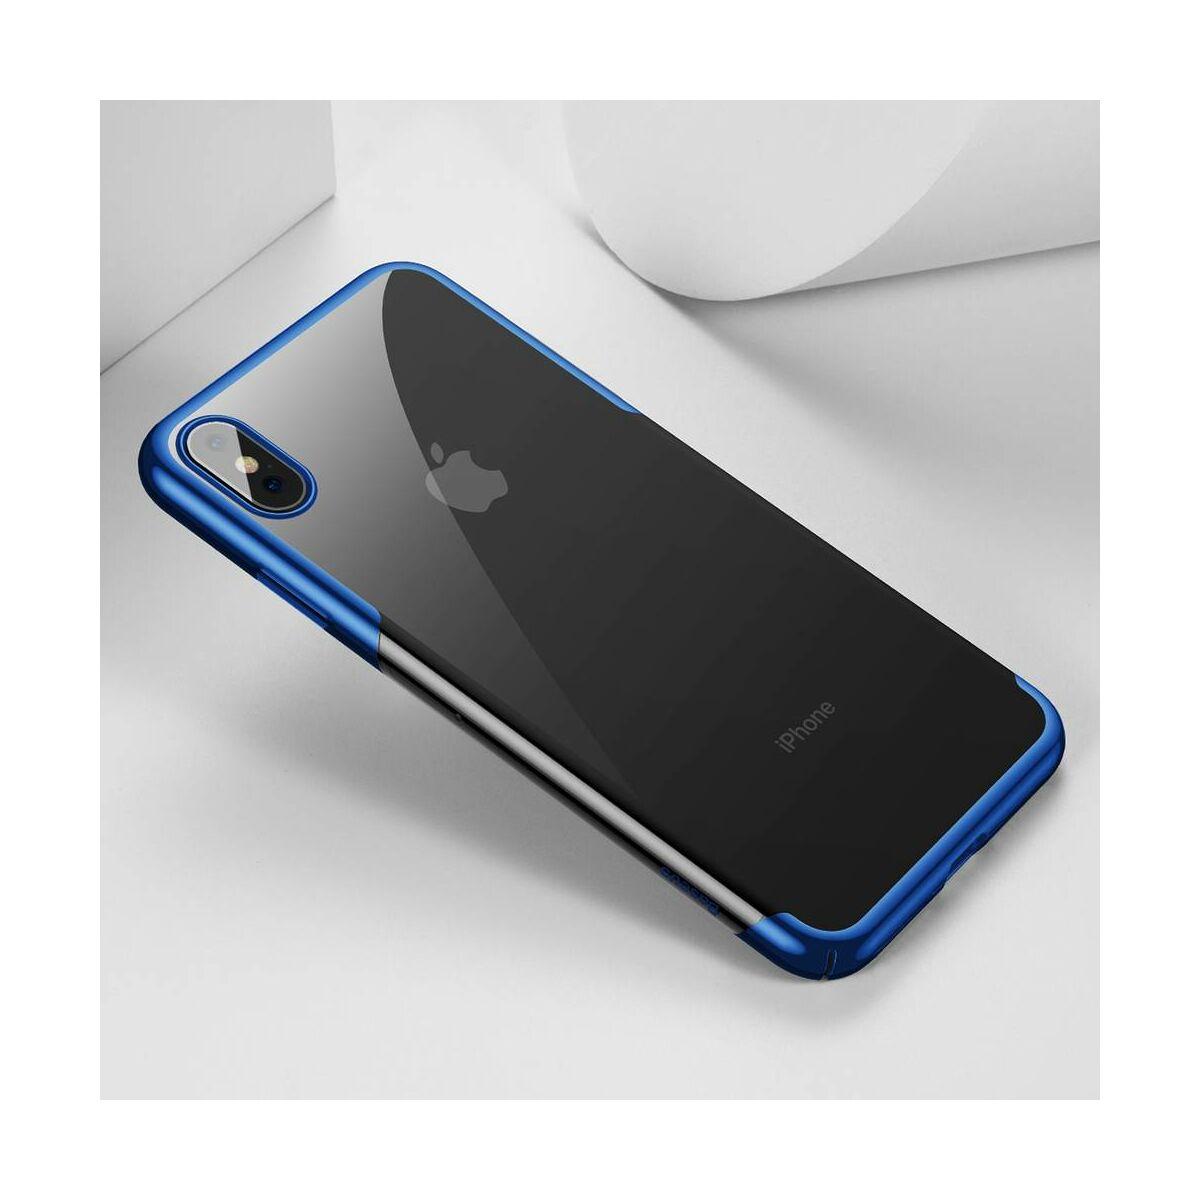 Baseus iPhone XS Max tok, Glitter, kék (WIAPIPH65-DW03)